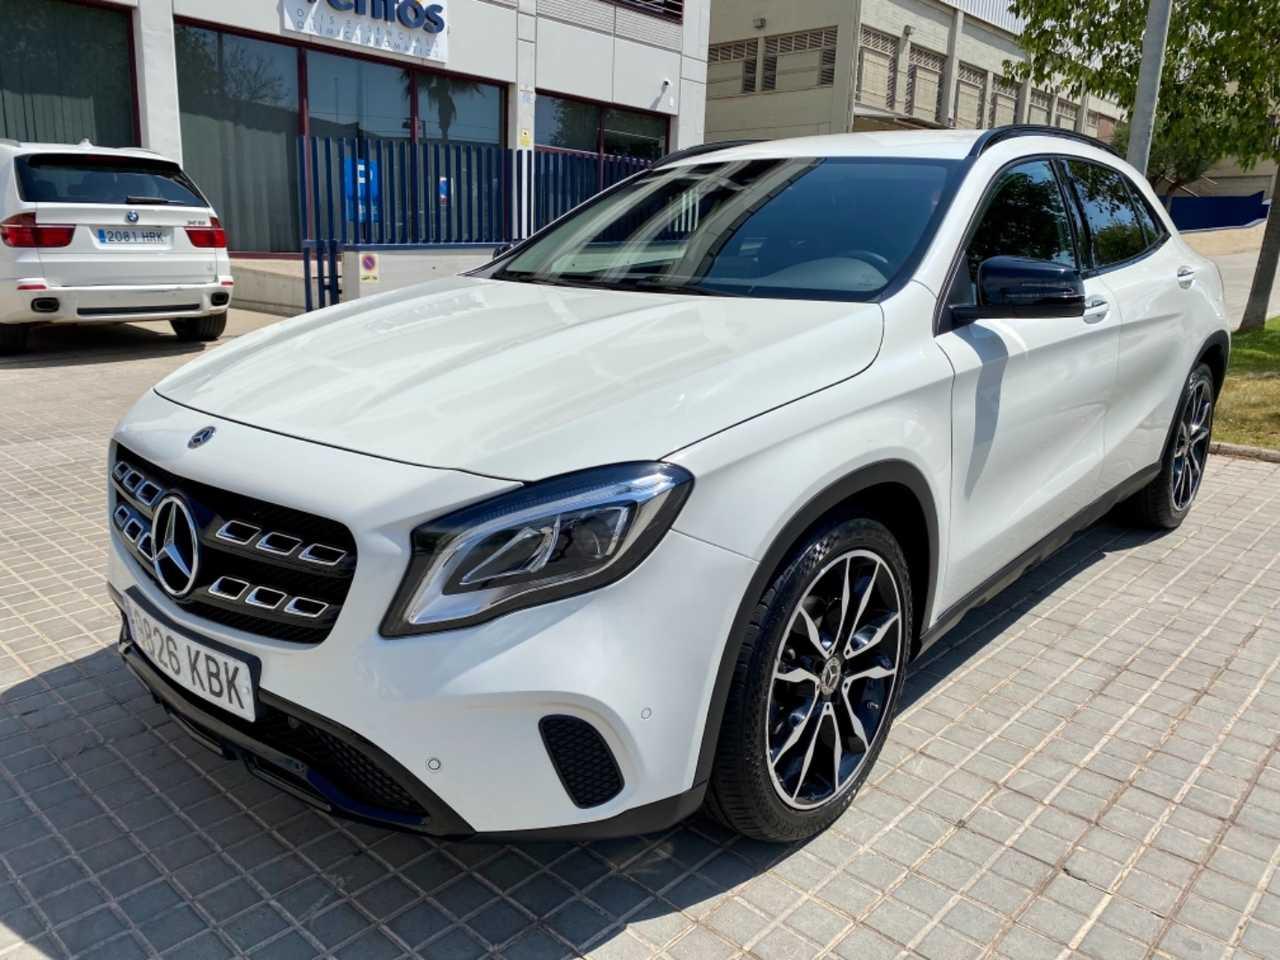 Mercedes GLA 220 CDI AUT AMG Line   - Foto 1